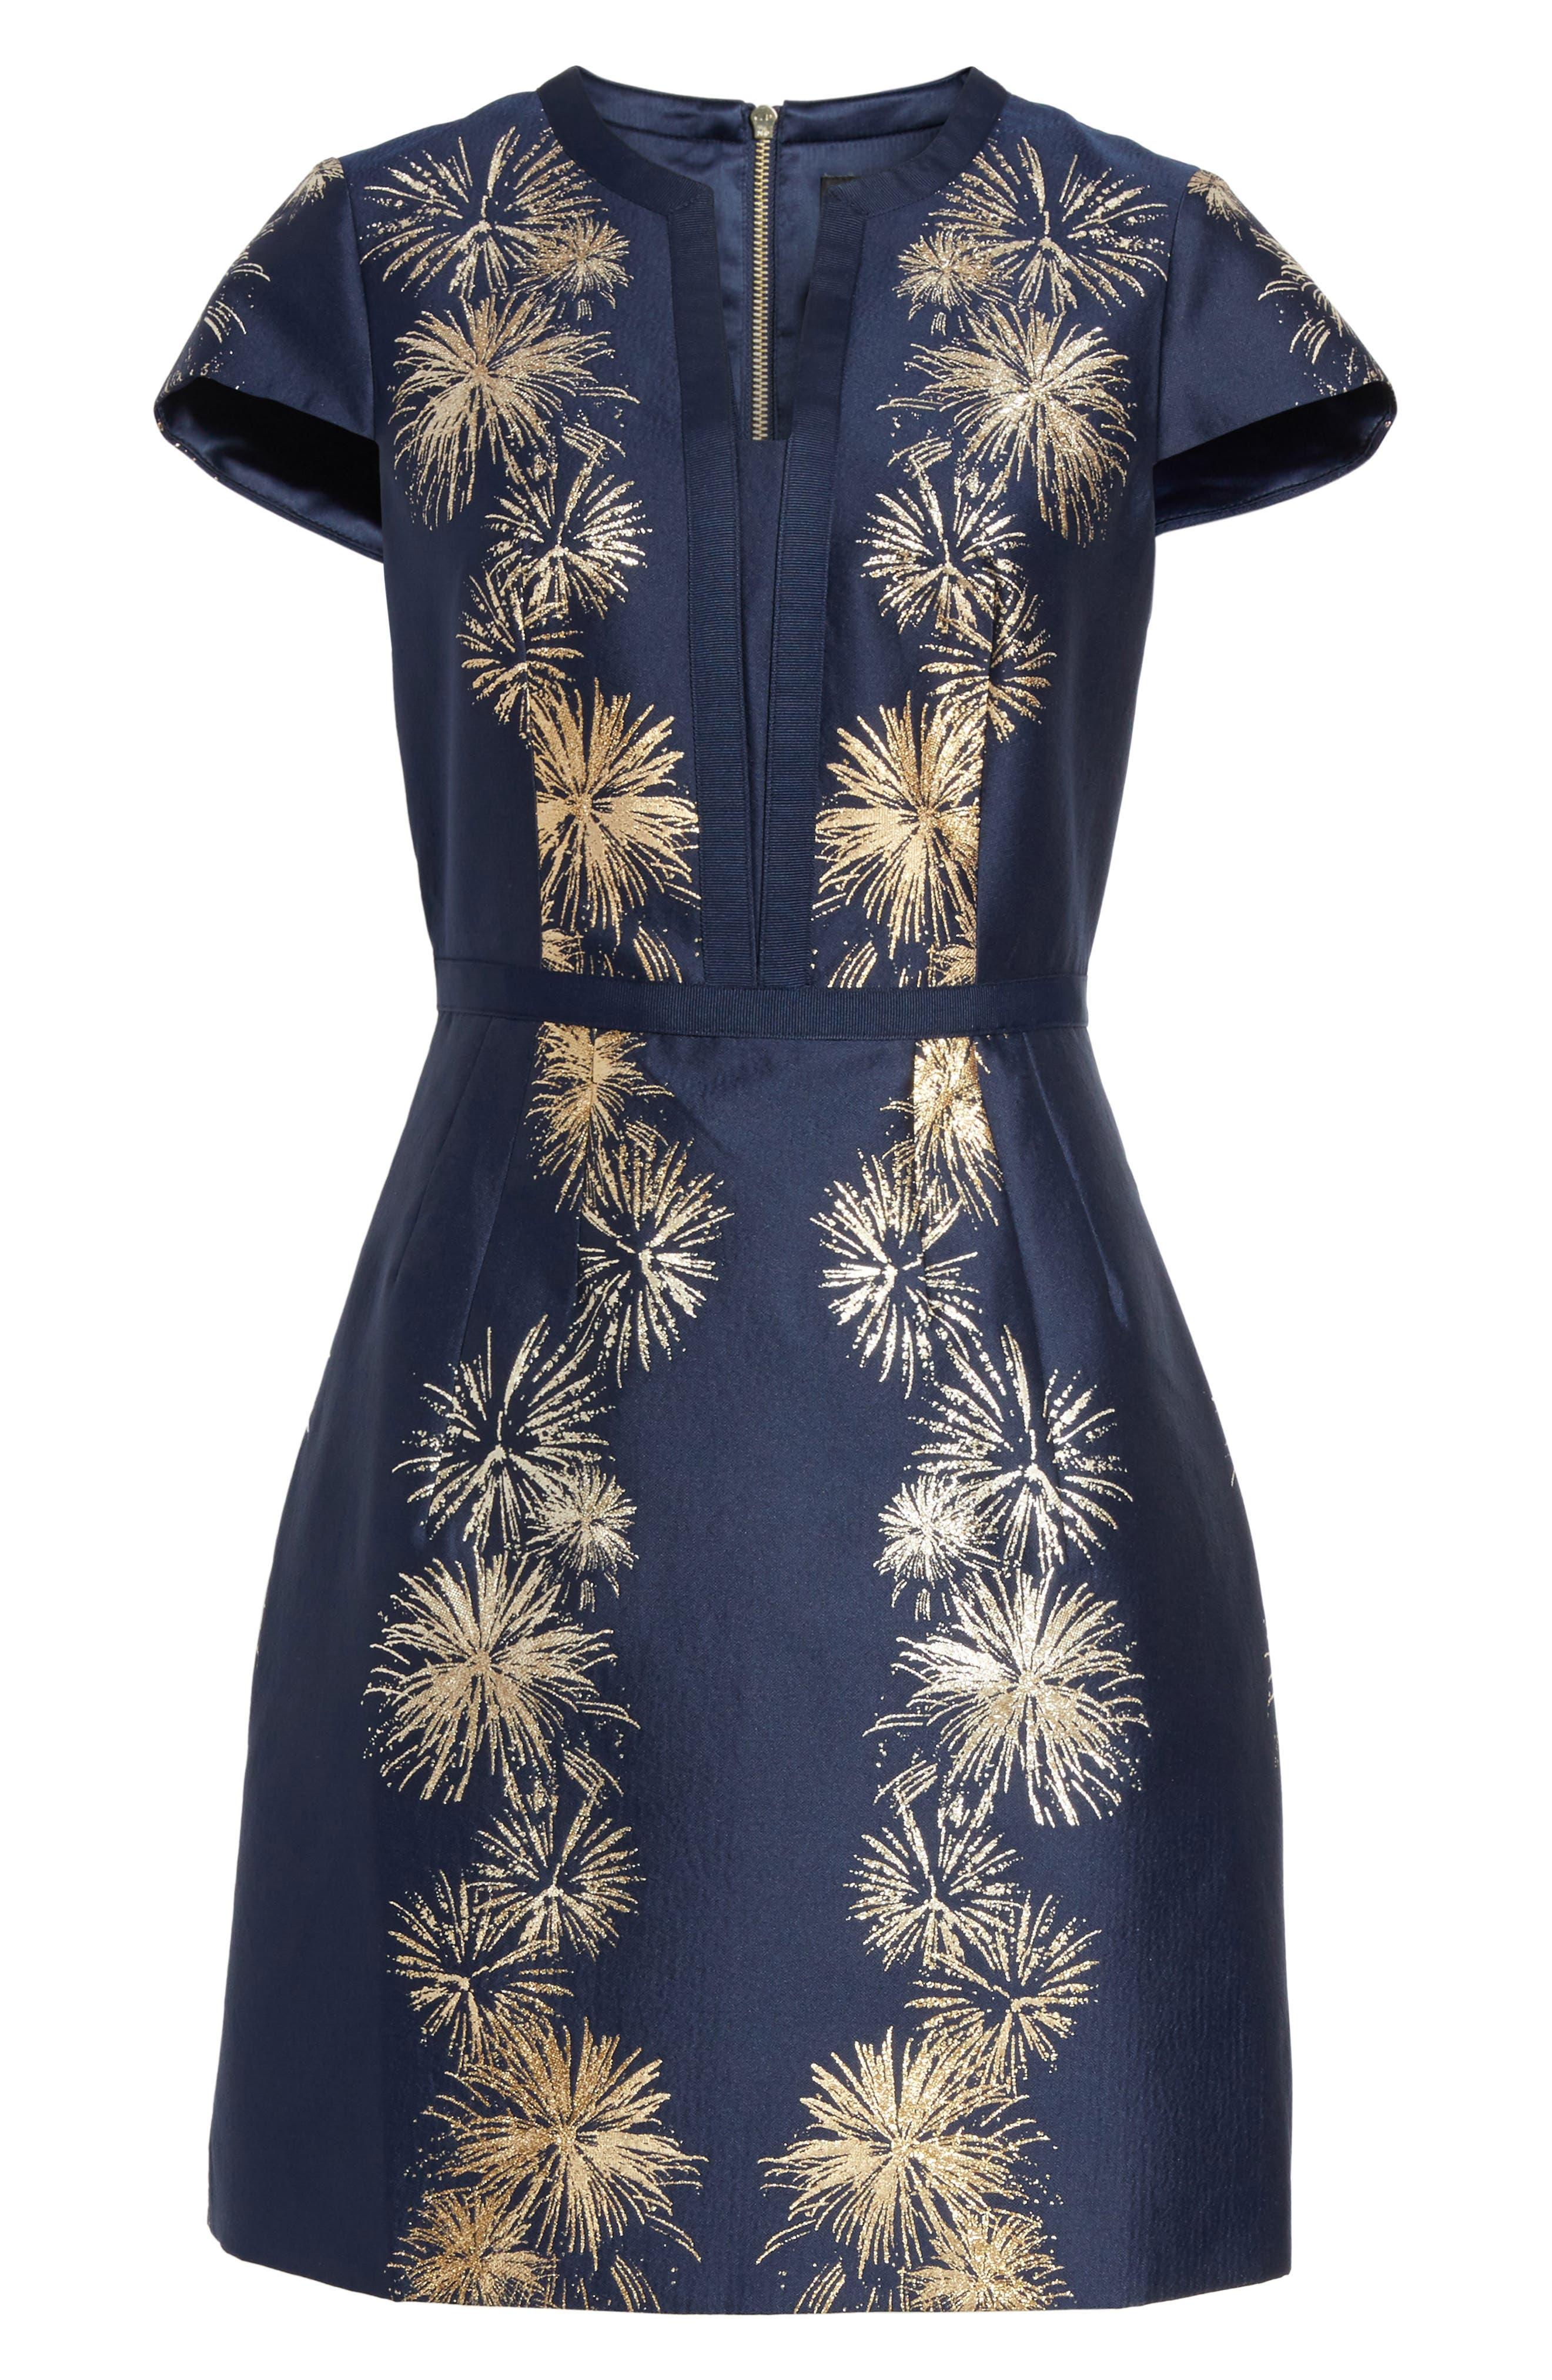 Tzalla Sculpted Stardust Jacquard Dress,                             Alternate thumbnail 6, color,                             402